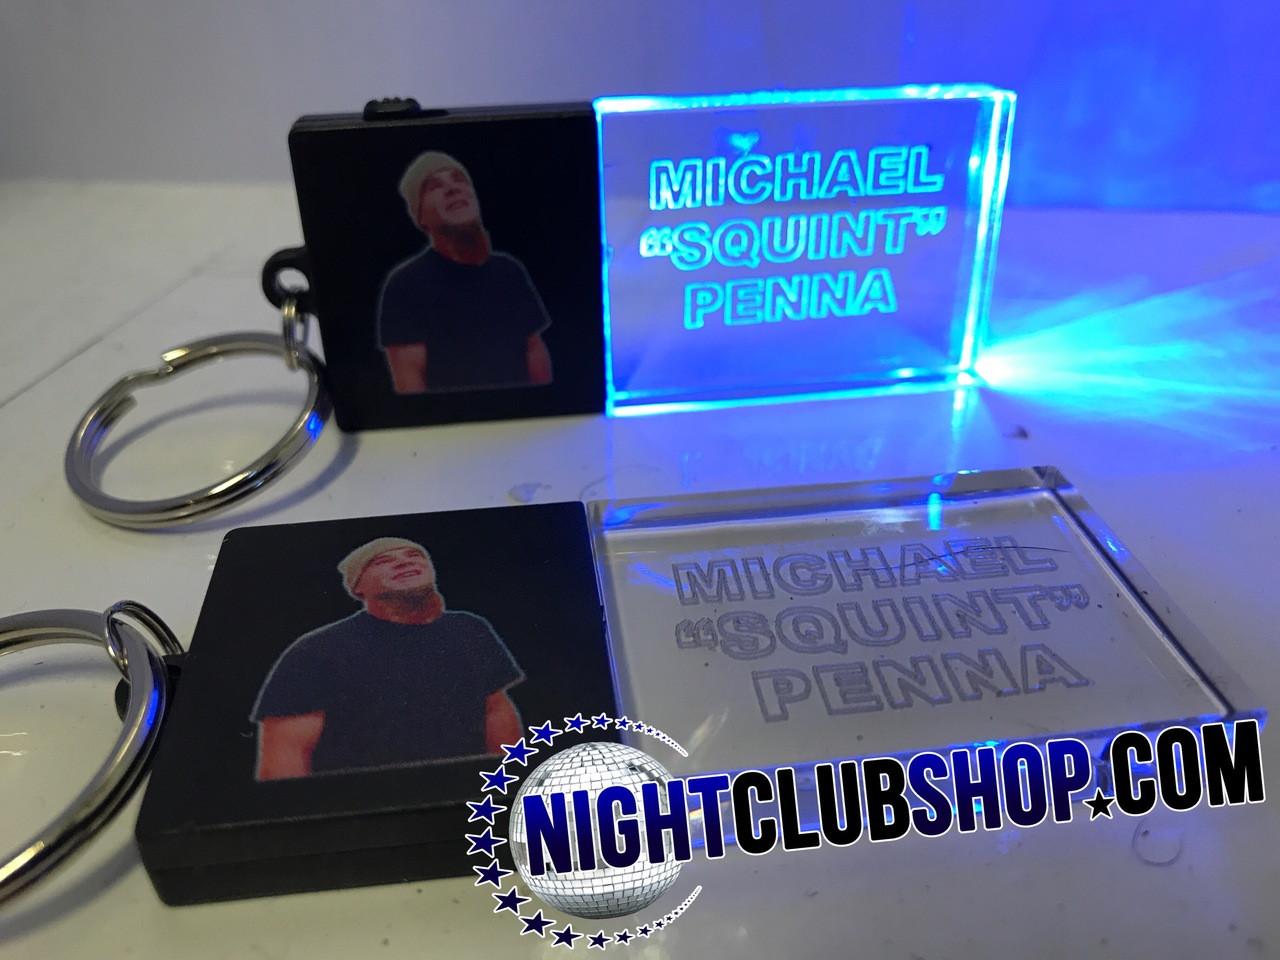 Beam,LED,Keychain,Key,chain,LED keychain, custom, BEAM, dual, print,engraved, logo,text, laser engraved,dual brand, personalized,promo,merch,fundraiser,nightclub,fund raiser,RIP Squint